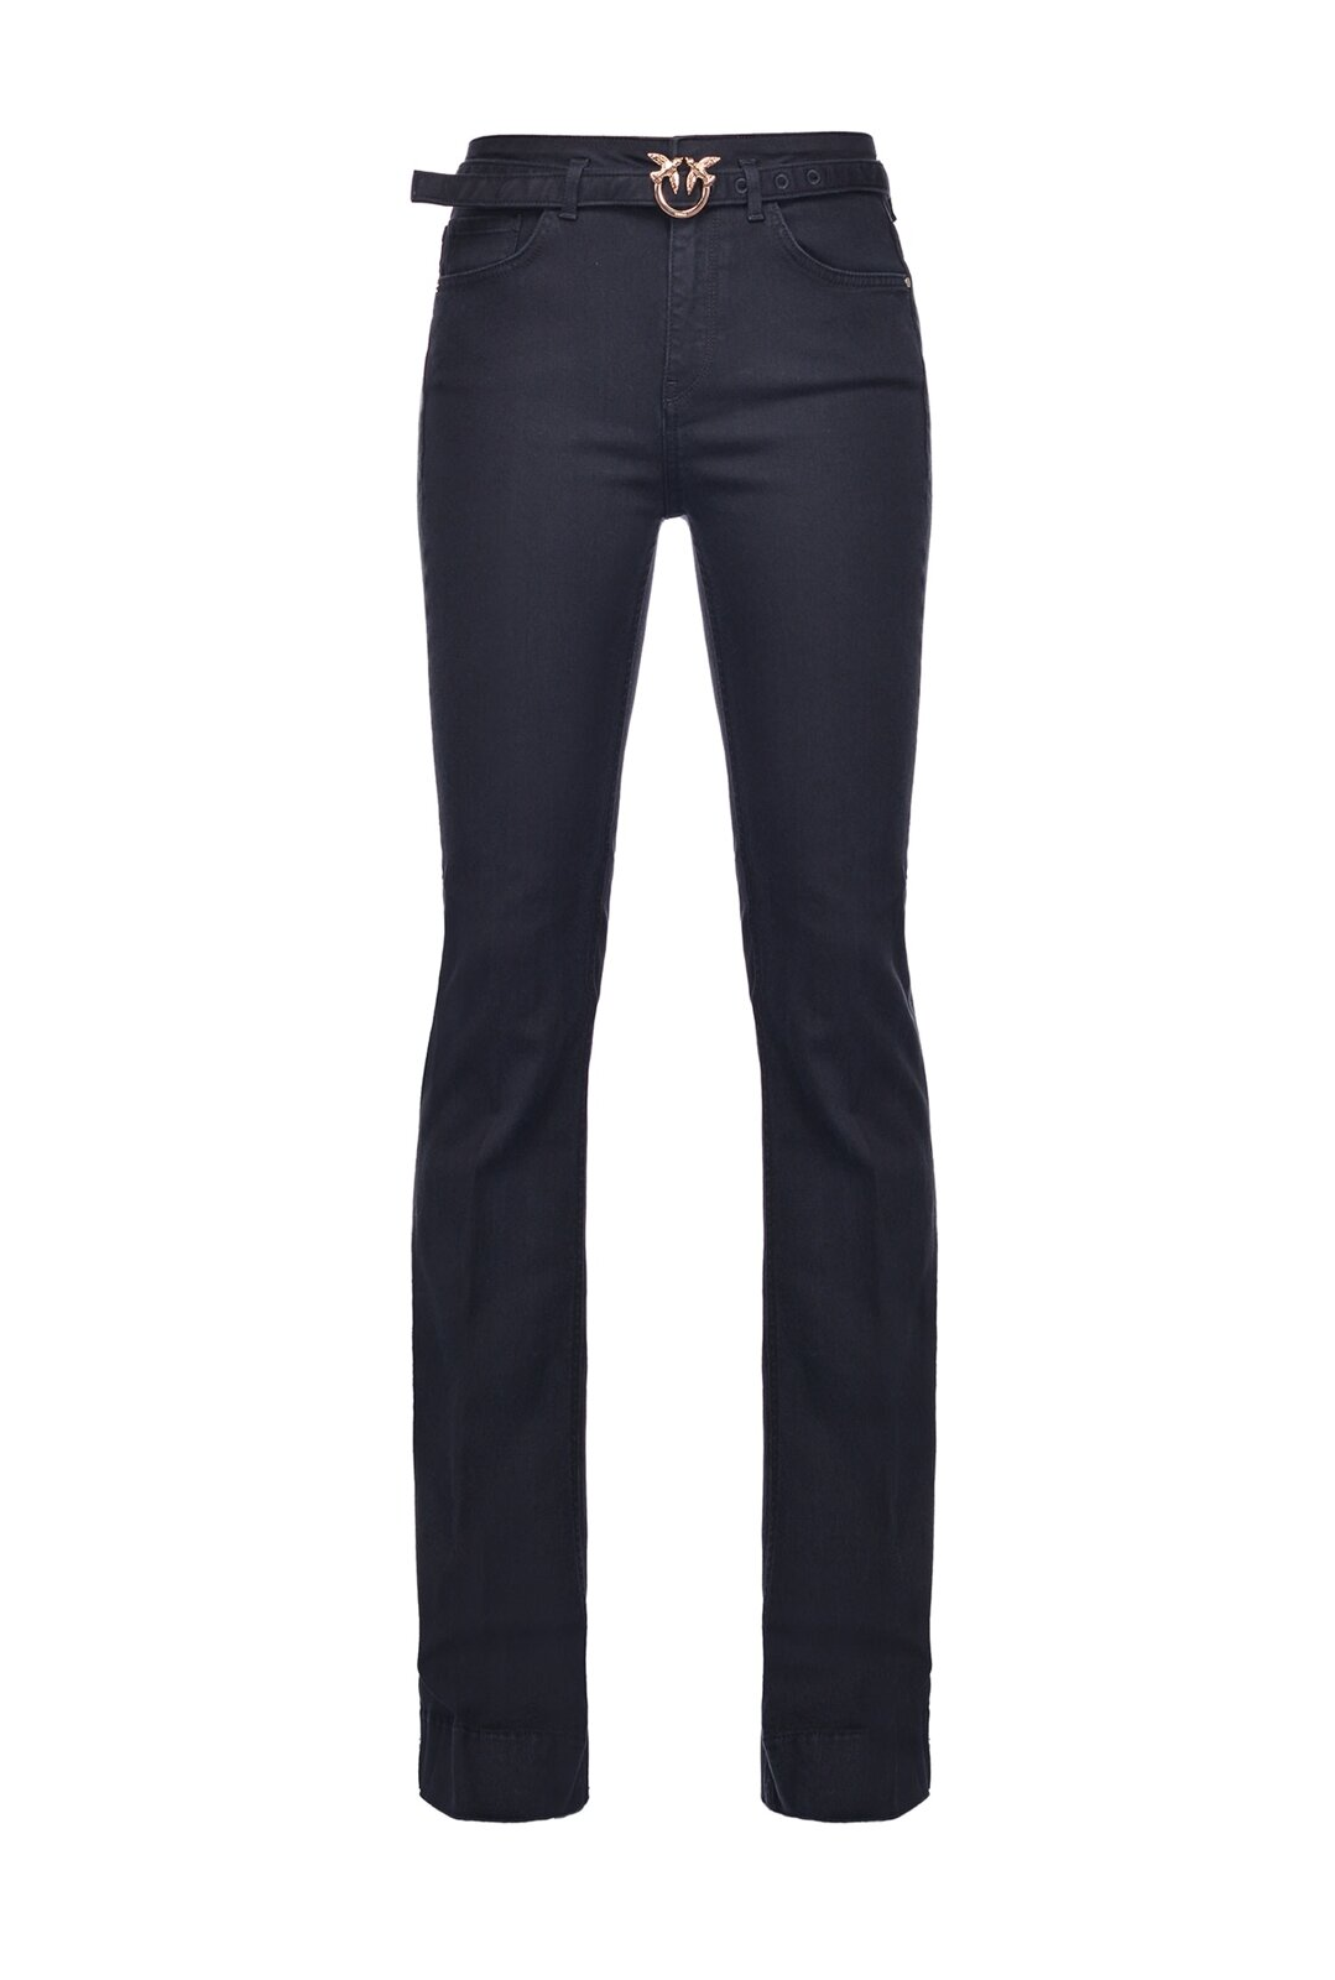 Jeans Flare In Denim Black Stretch Con Cintura - Pinko